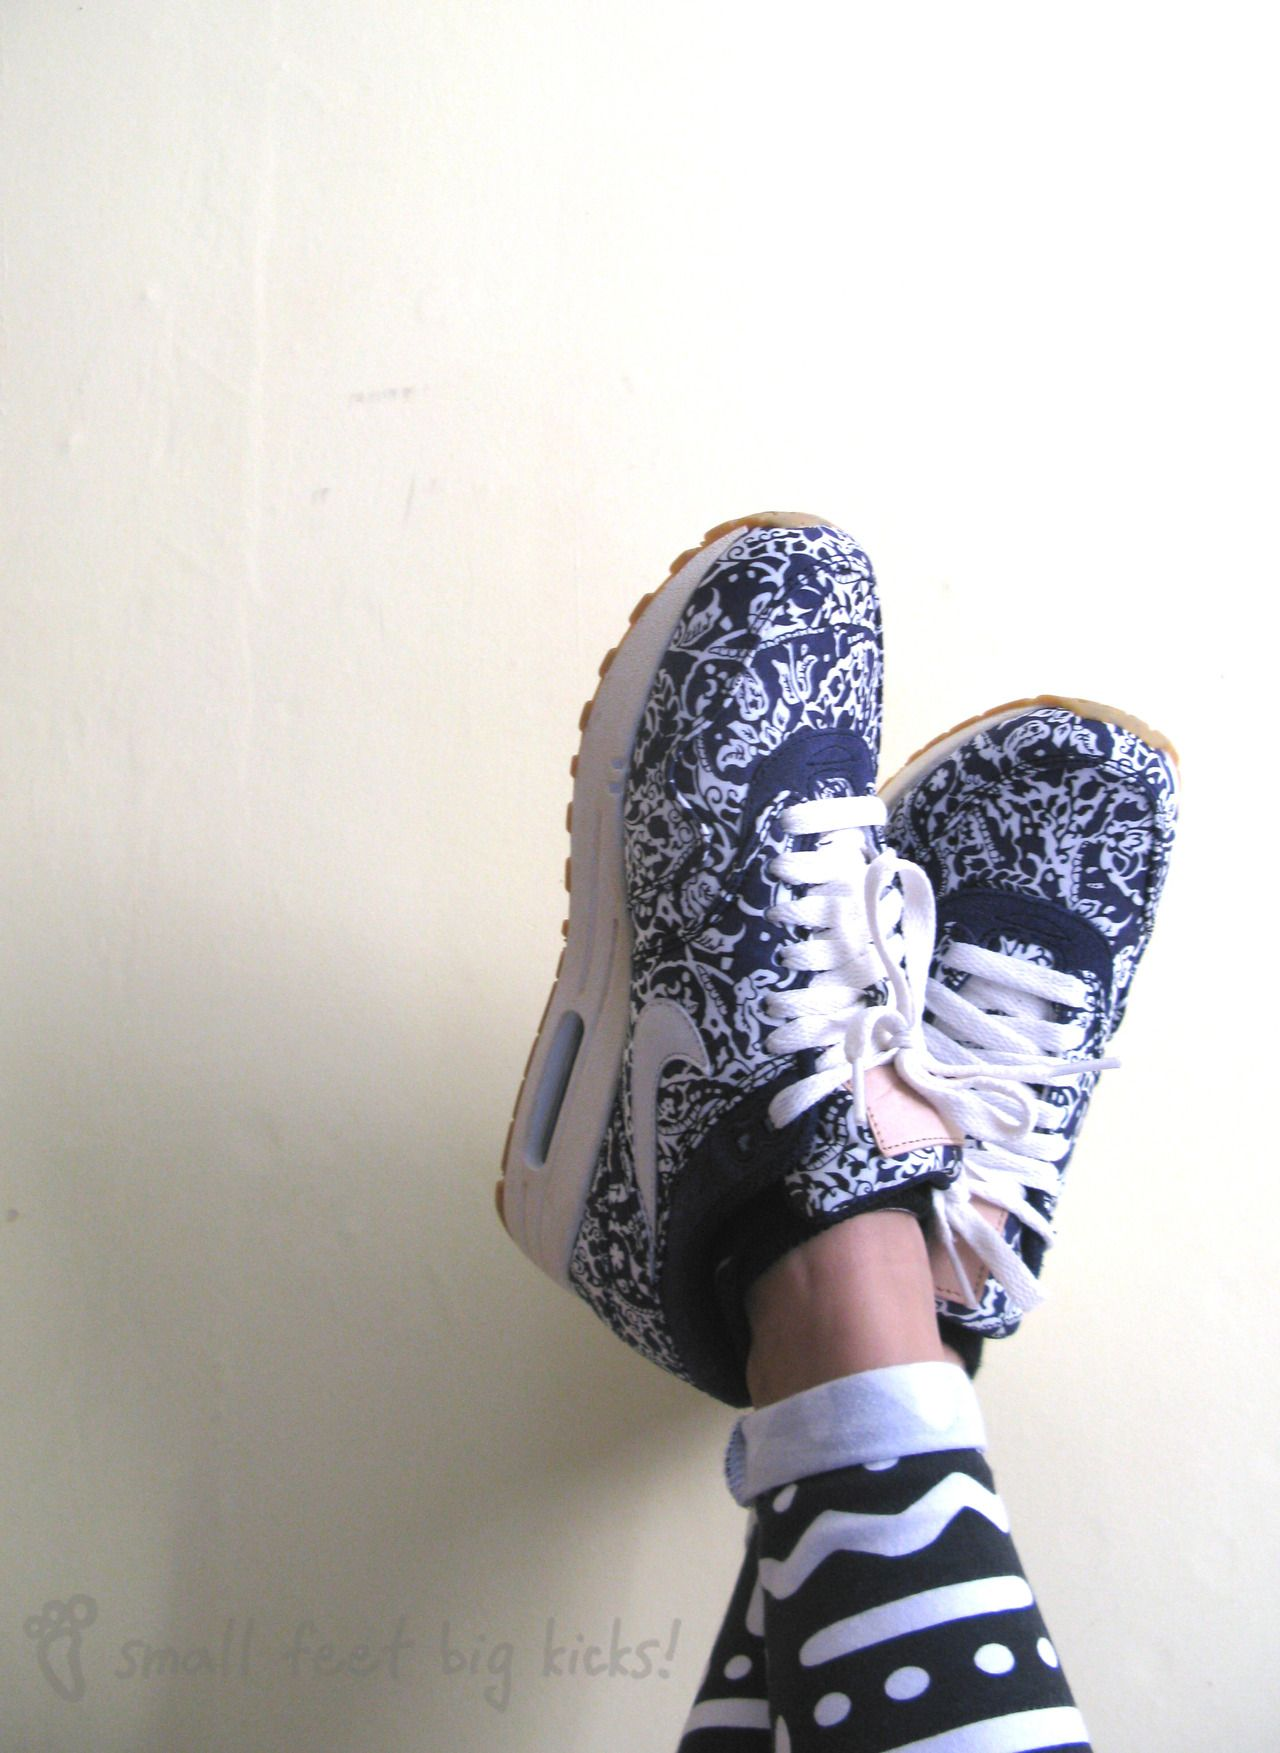 mad kicks